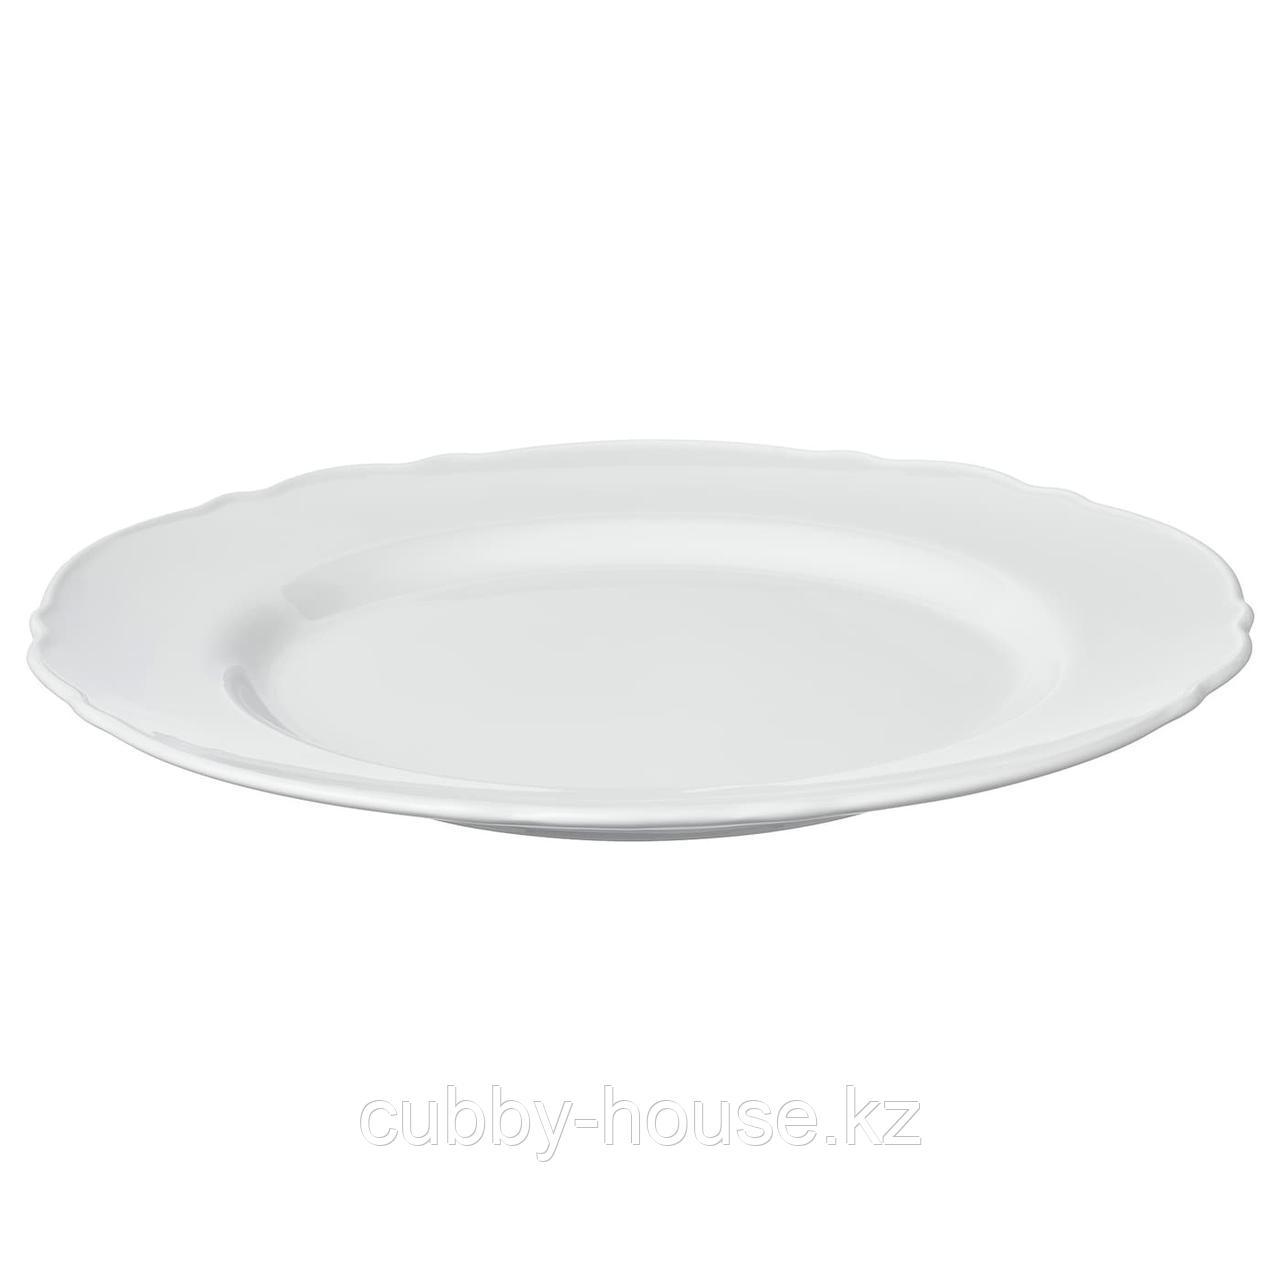 УППЛАГА Тарелка, белый, 28 см